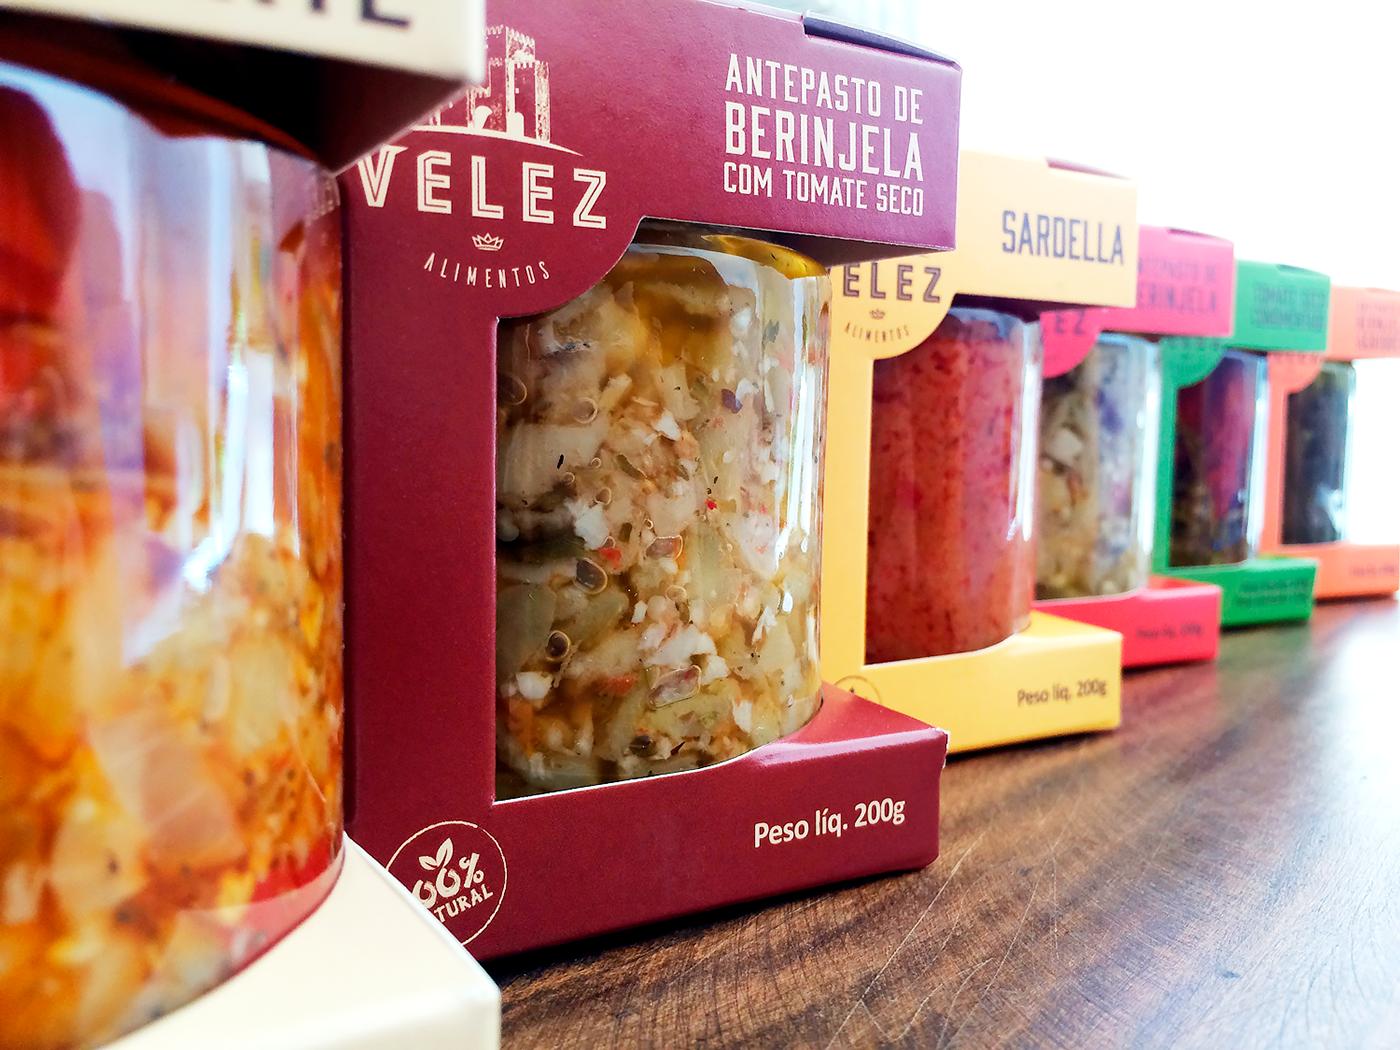 food design product packaging antepasto antipasti Salsa Packaging antipasto fresh organic natural healthy